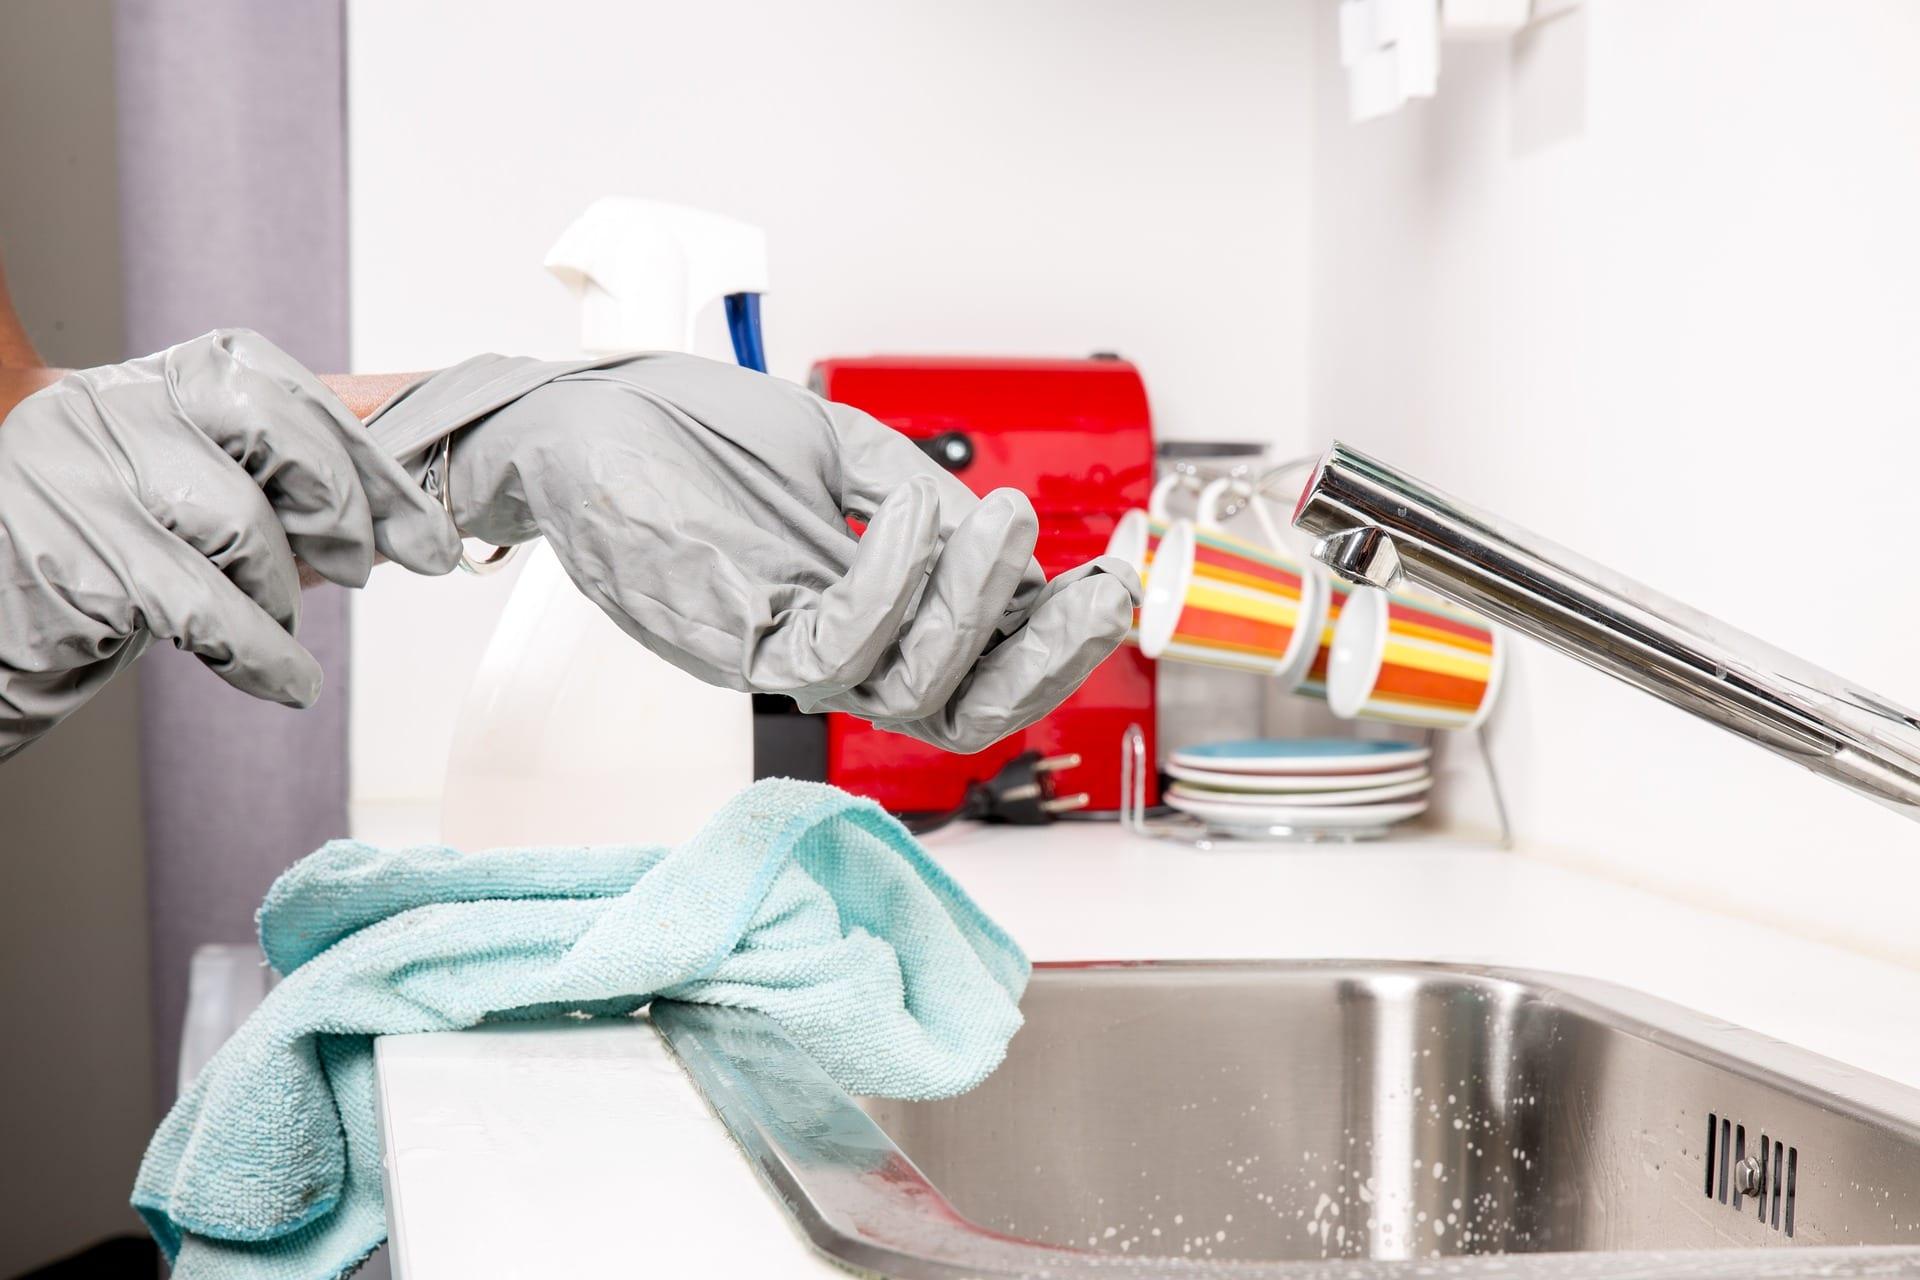 Taking off gloves next to sink